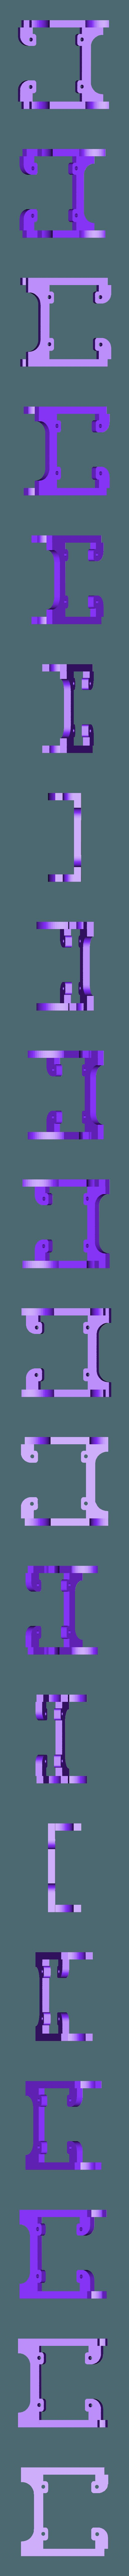 servo-mount.stl Download free STL file Steampunk Oculus Roboticus • 3D print design, cyrusharding